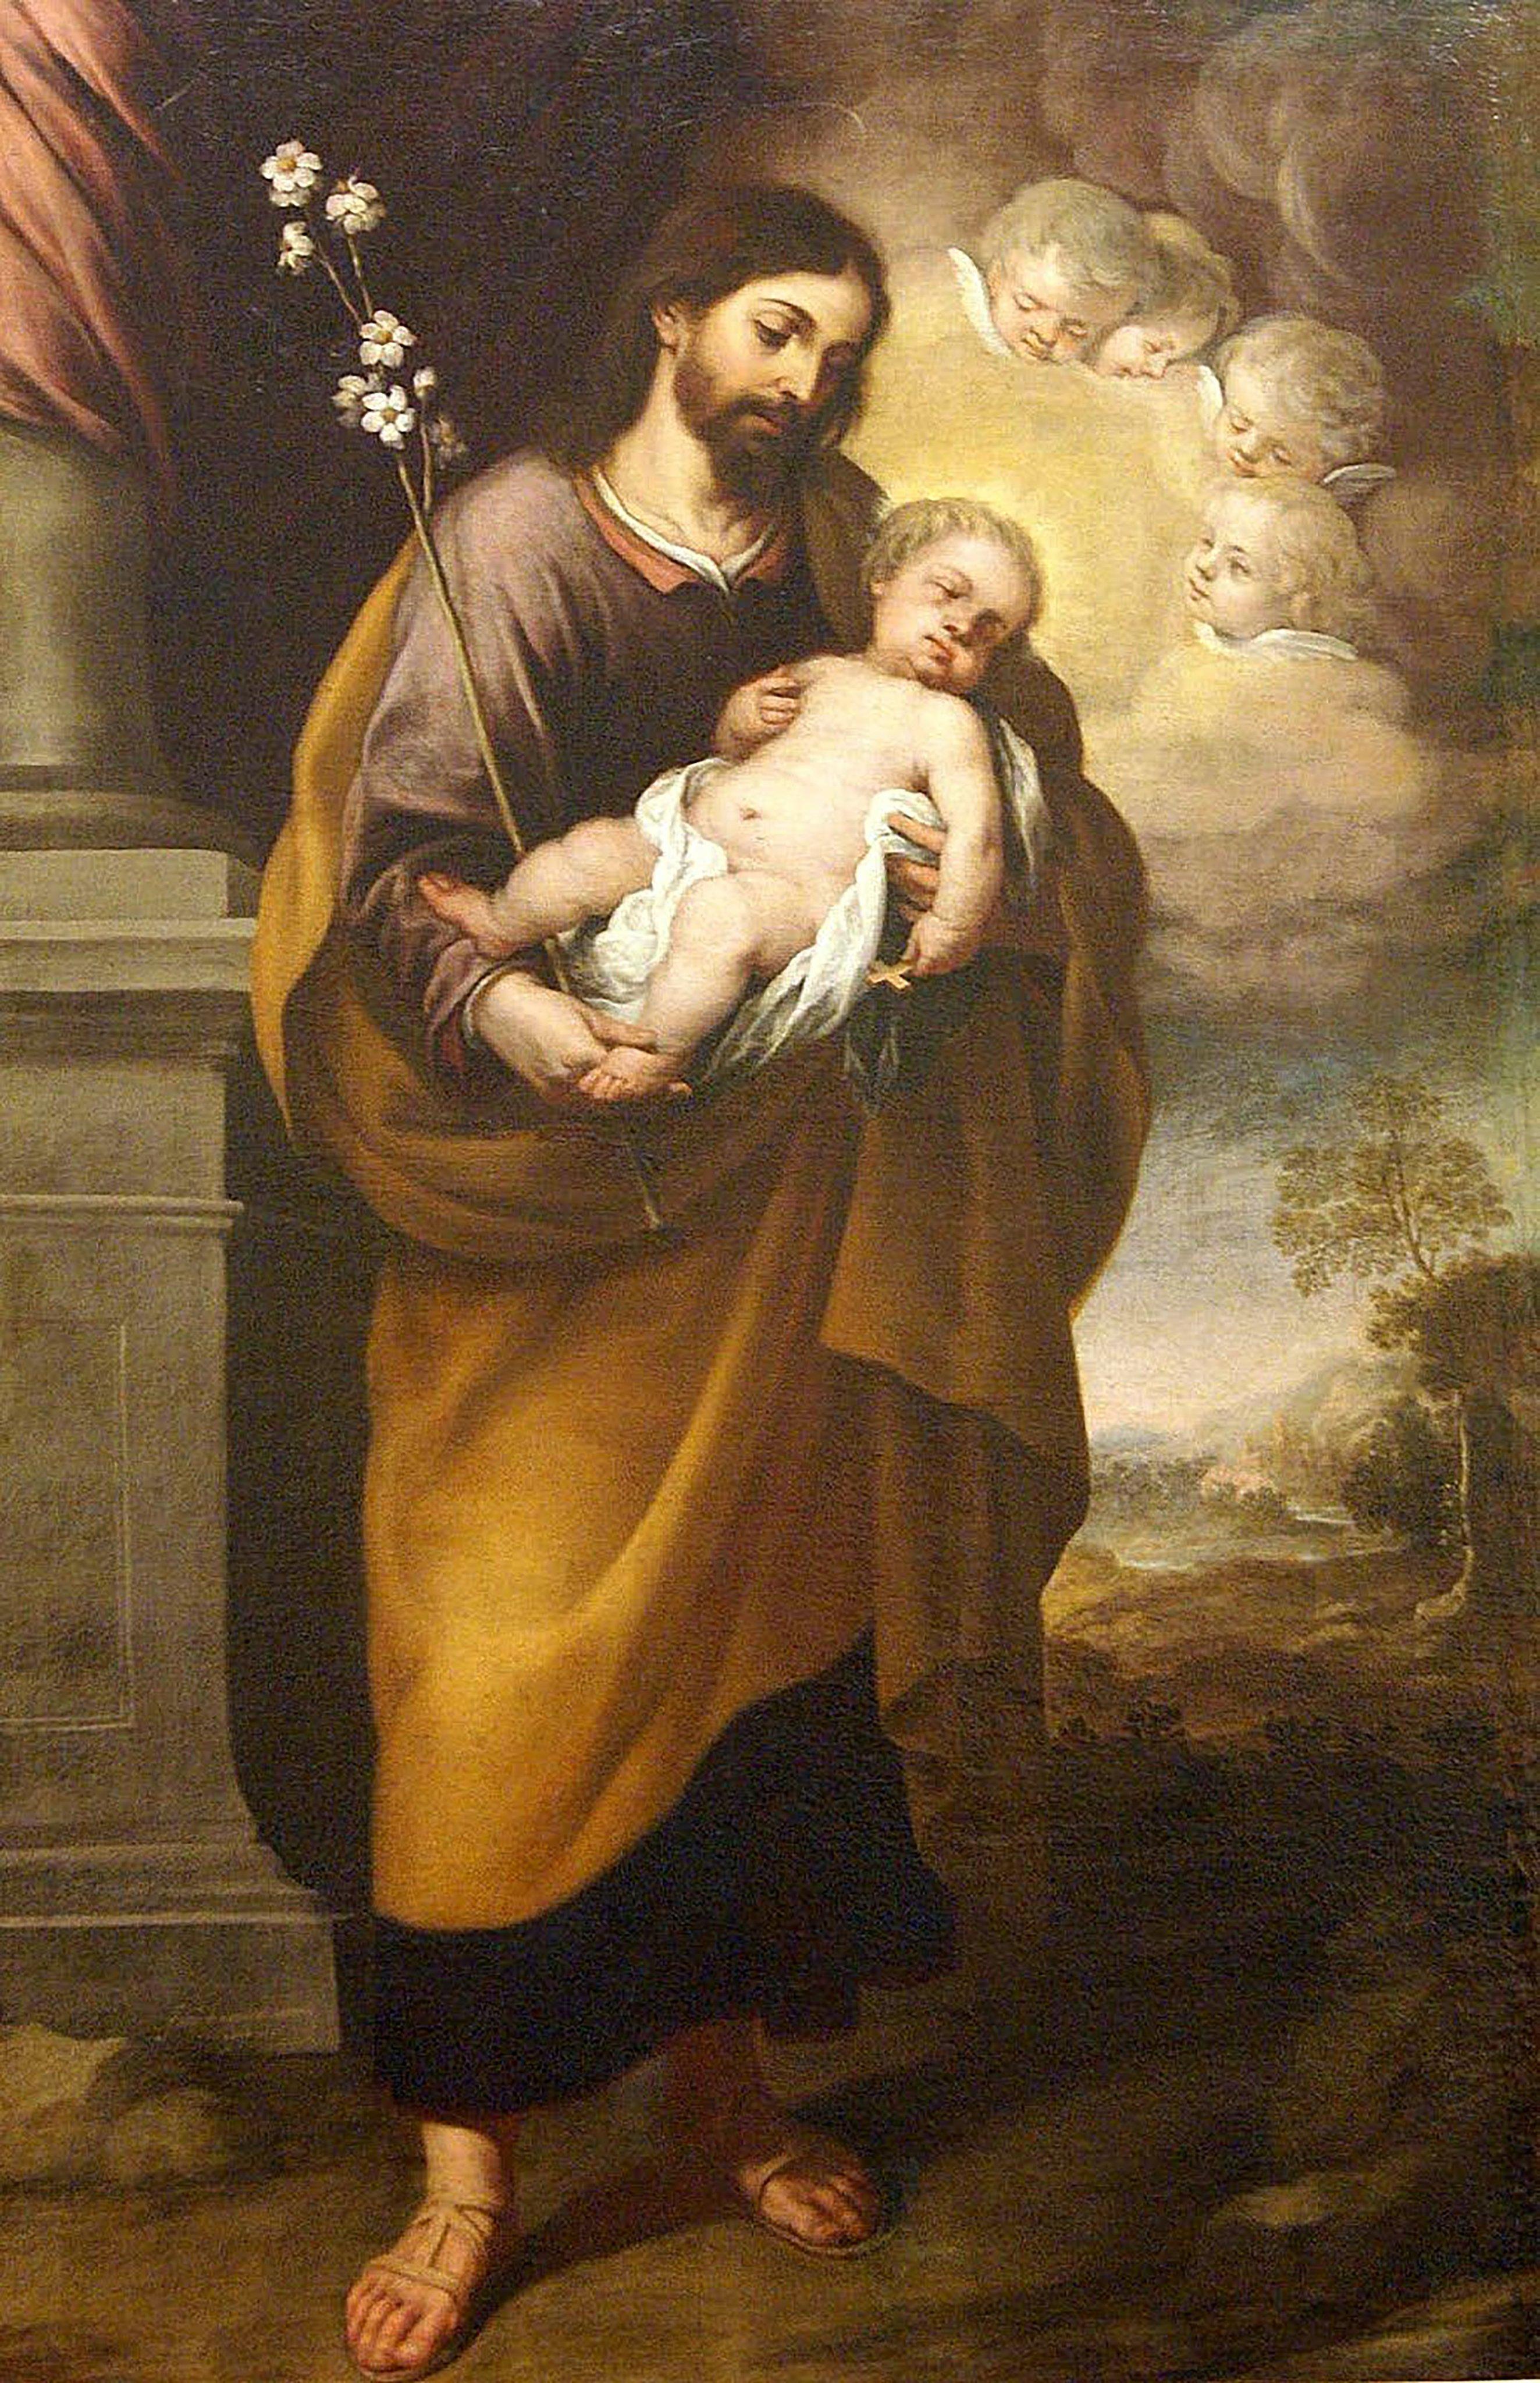 Wallpaper of Saint Joseph